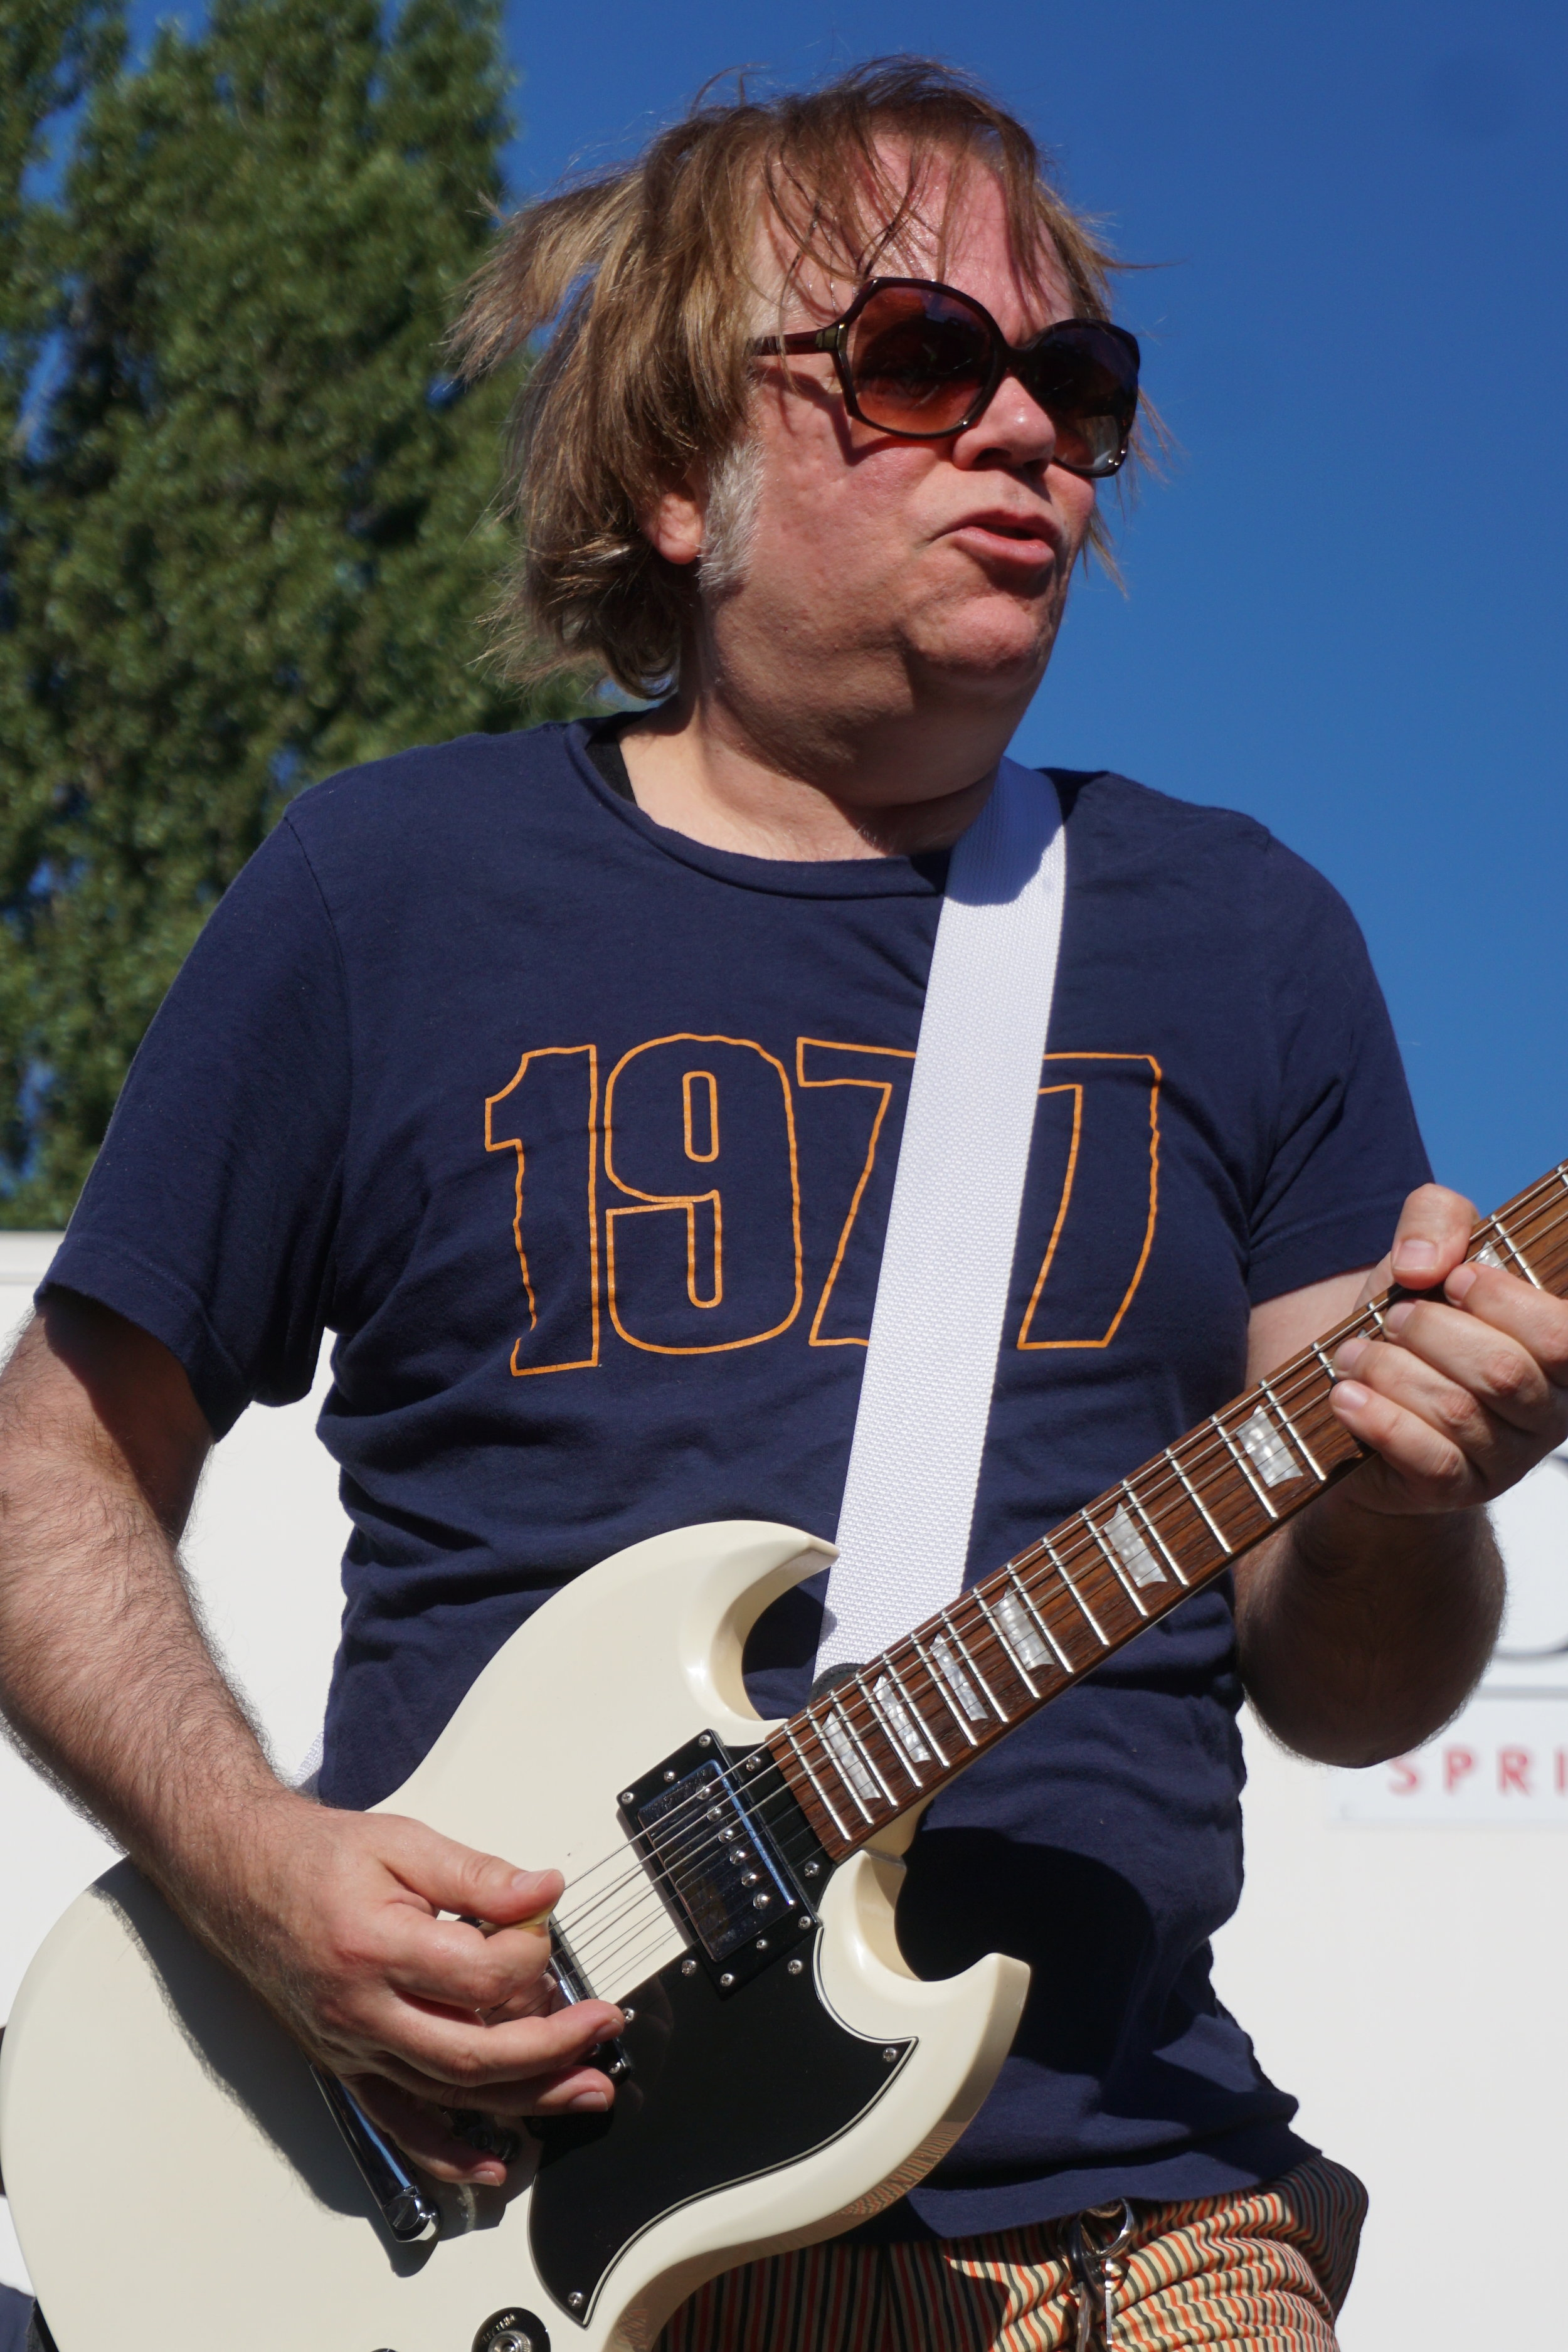 Kurt Bloch rocking it!